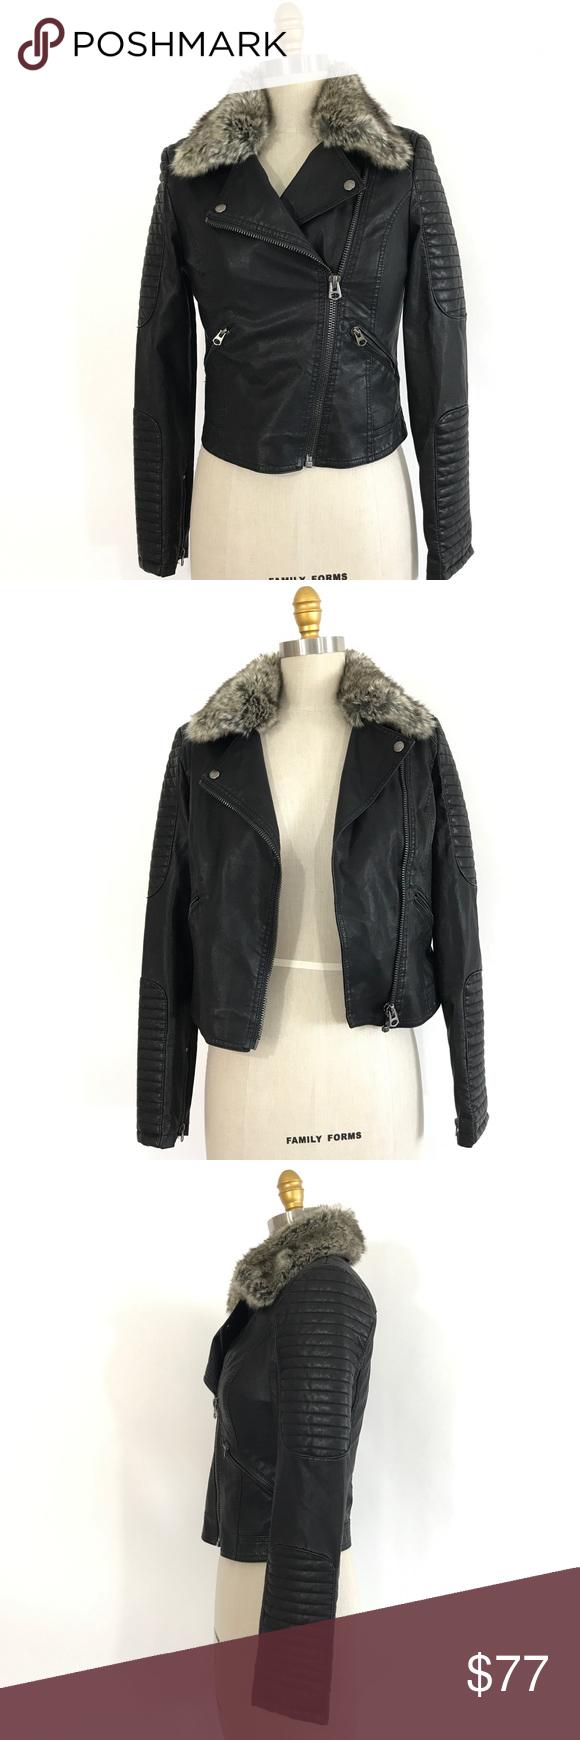 black faux leather fur biker jacket (With images